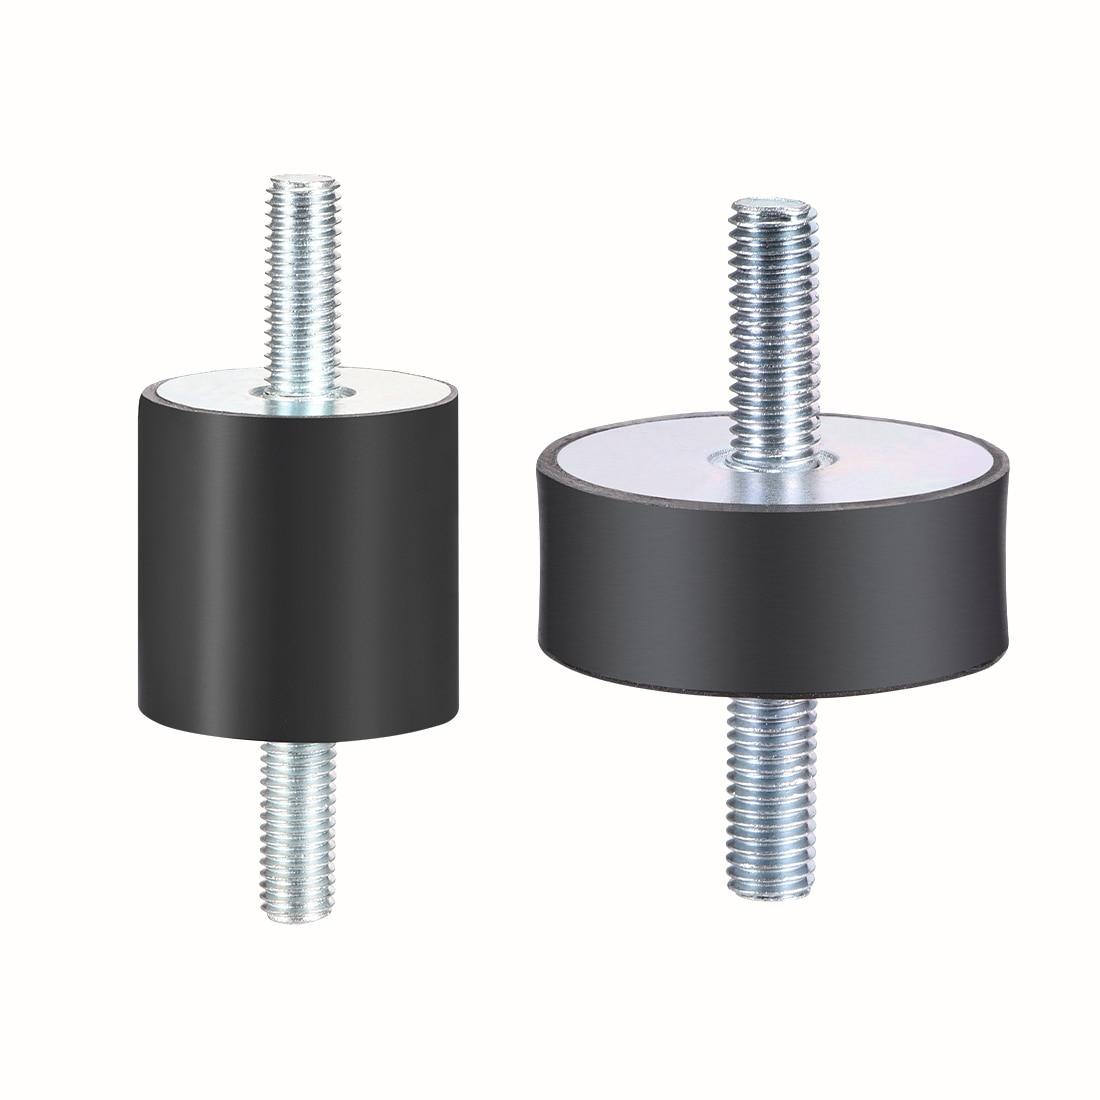 uxcell Rubber Vibration Isolator Mounts Shock Absorber 20mm 25mm 30mm 40mm 50mm 60mm Dia M6 M8  M10 M12 Thread with Studs